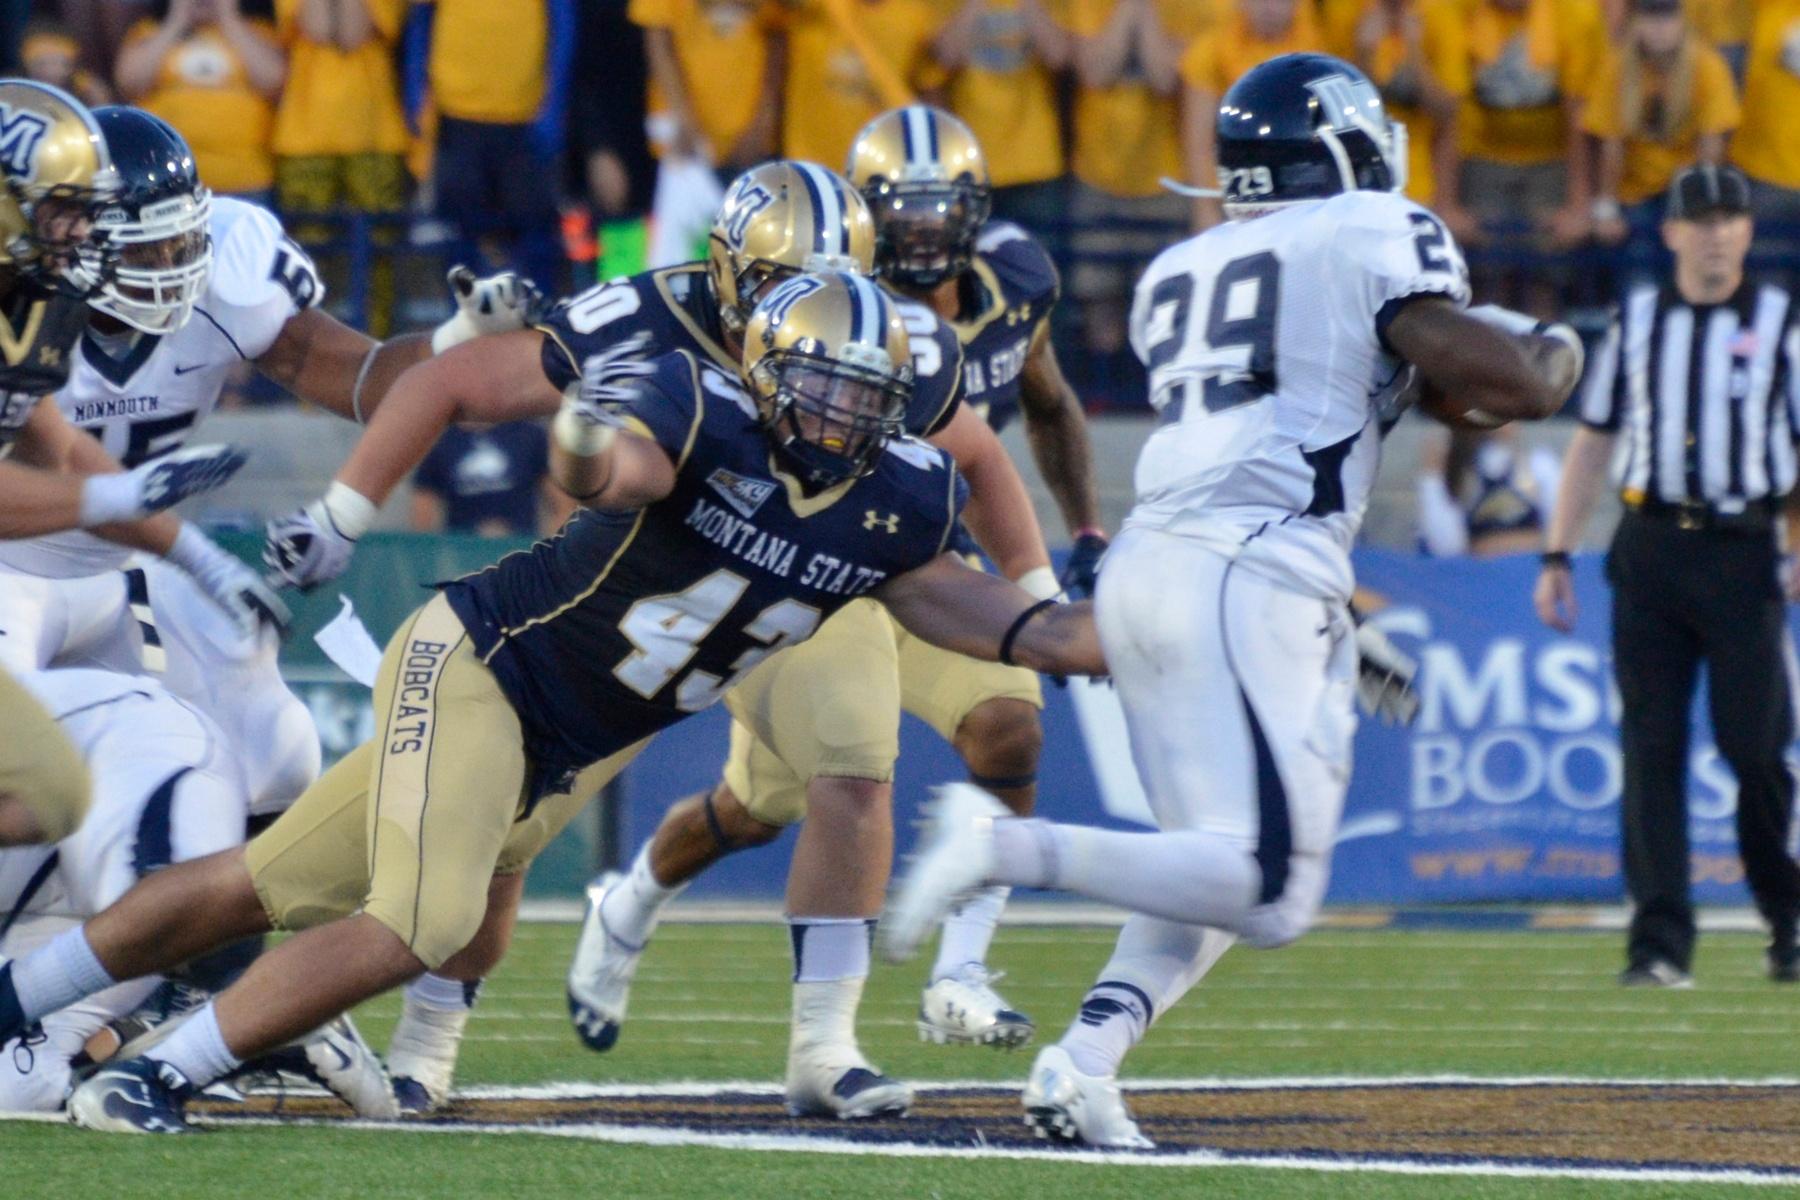 MSU Bobcats on the tackle